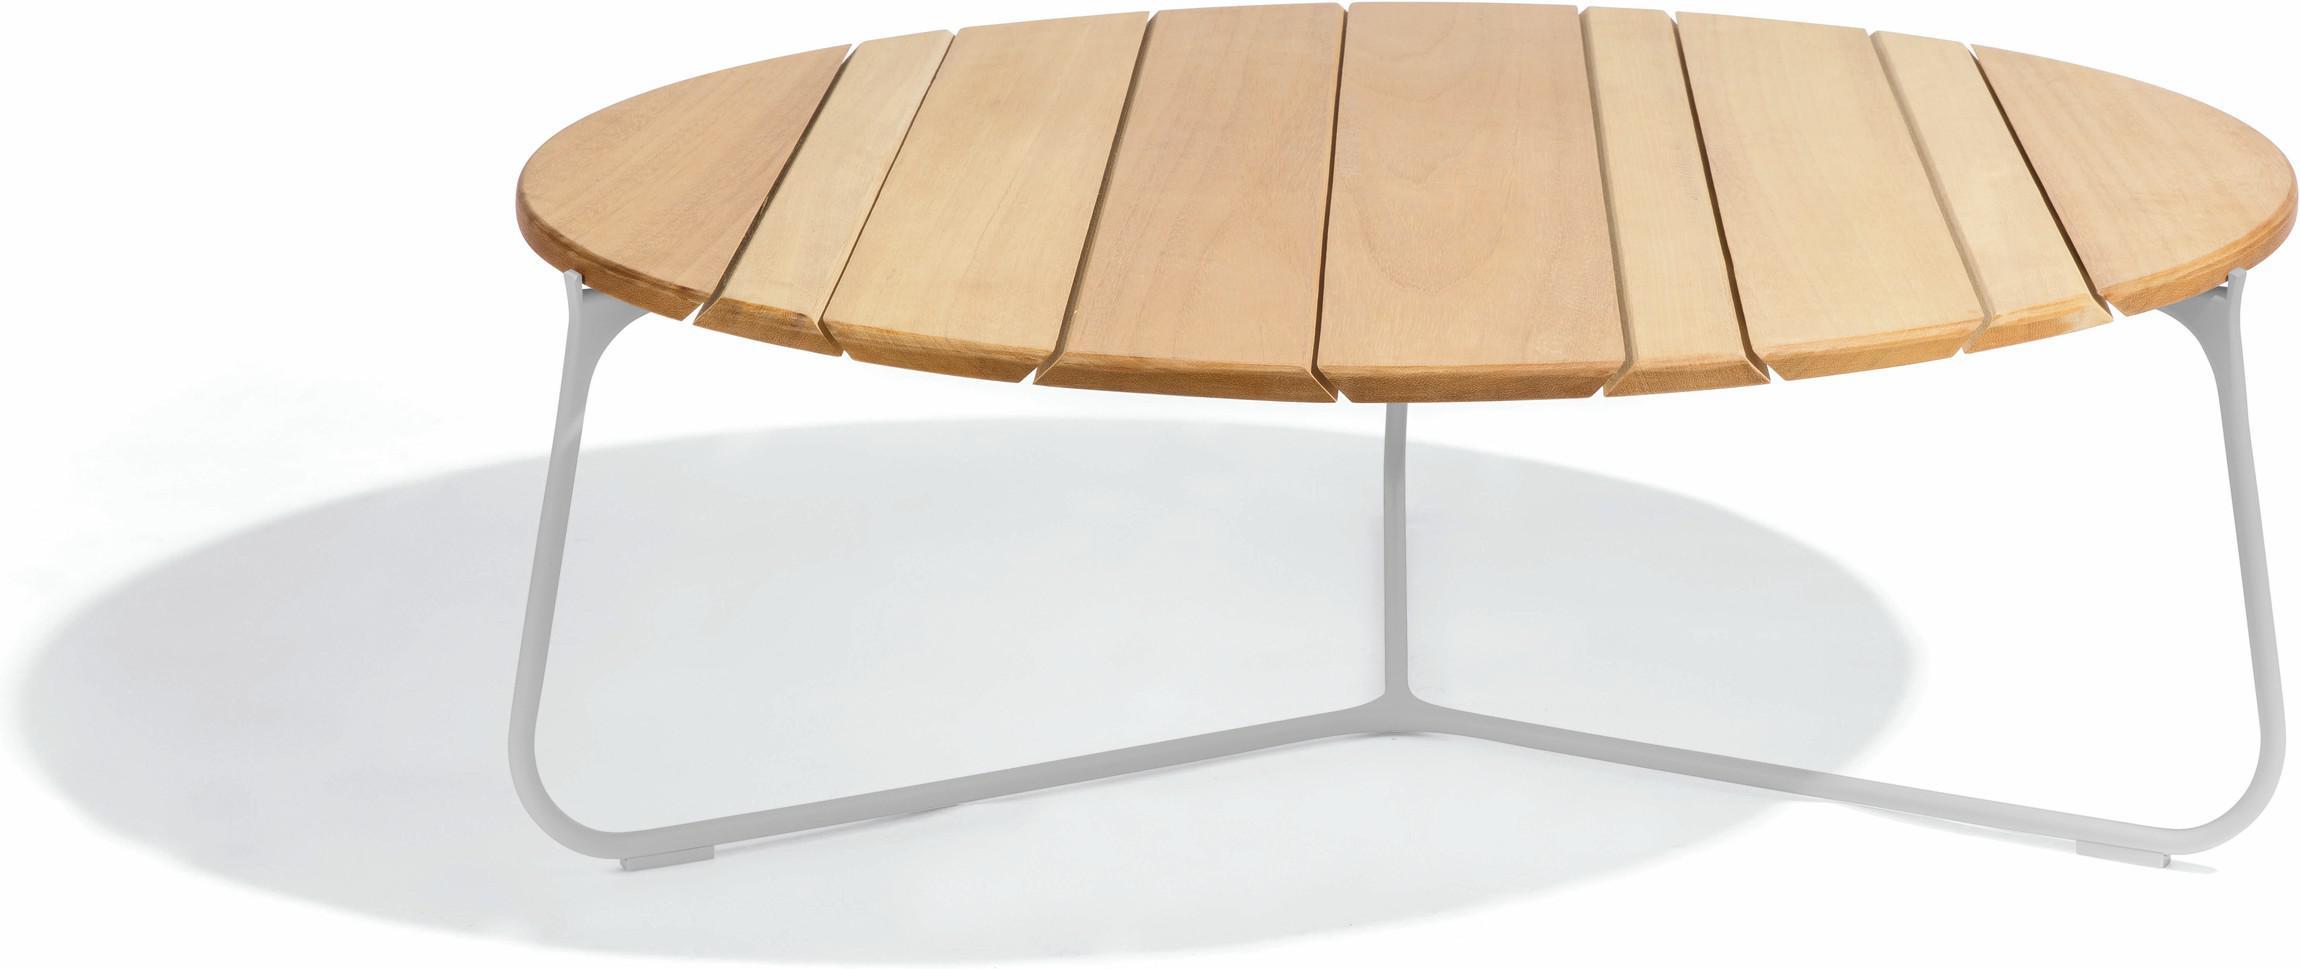 Mood coffee table - flint - Iroko 100